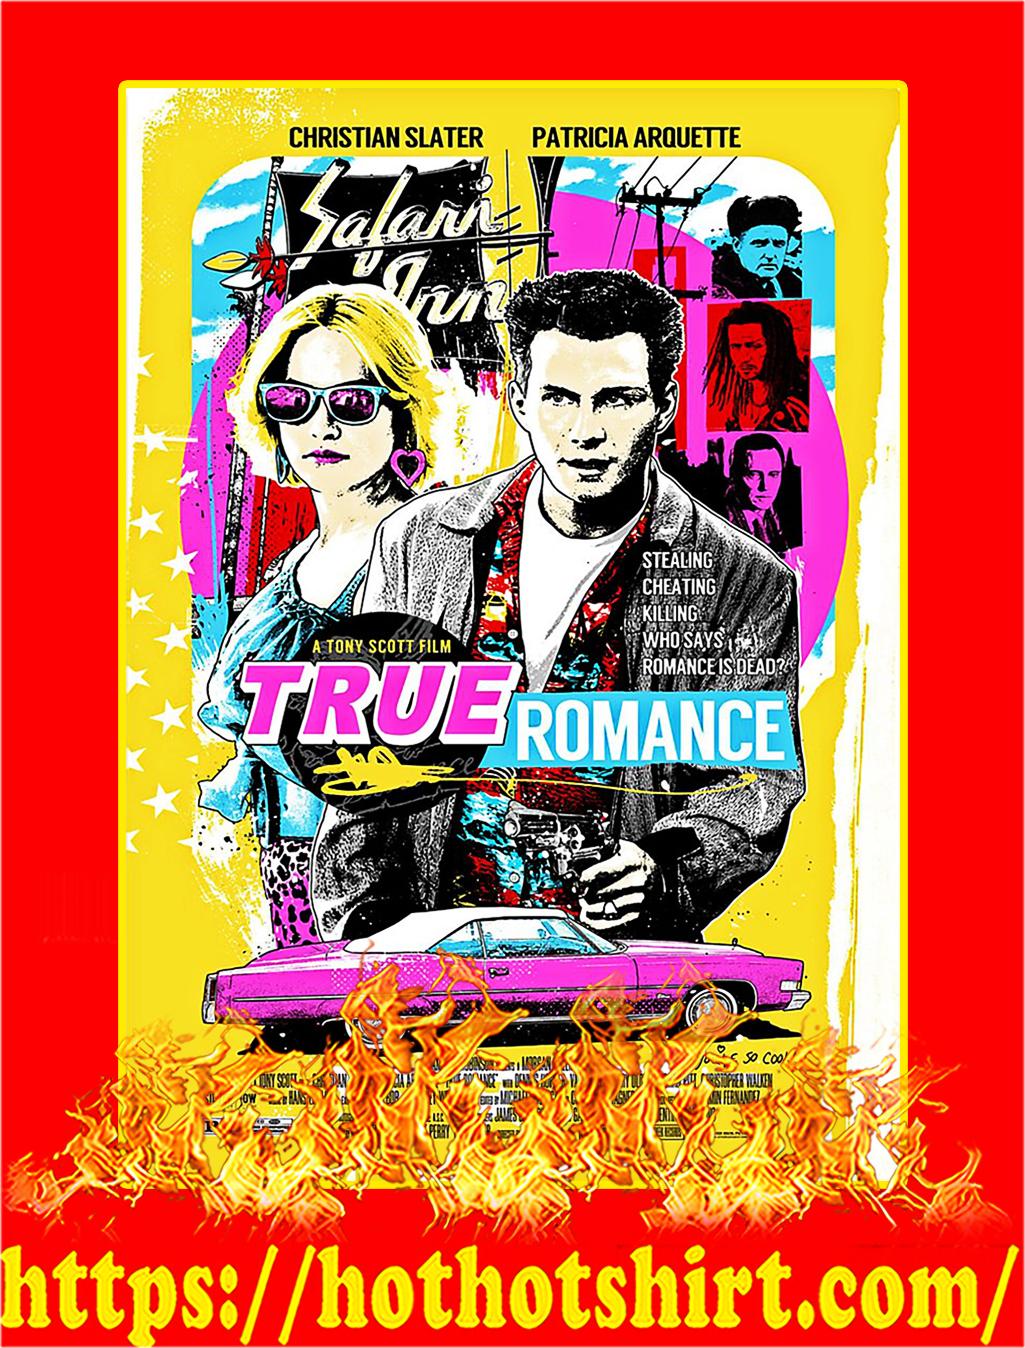 True Romance Poster - A4